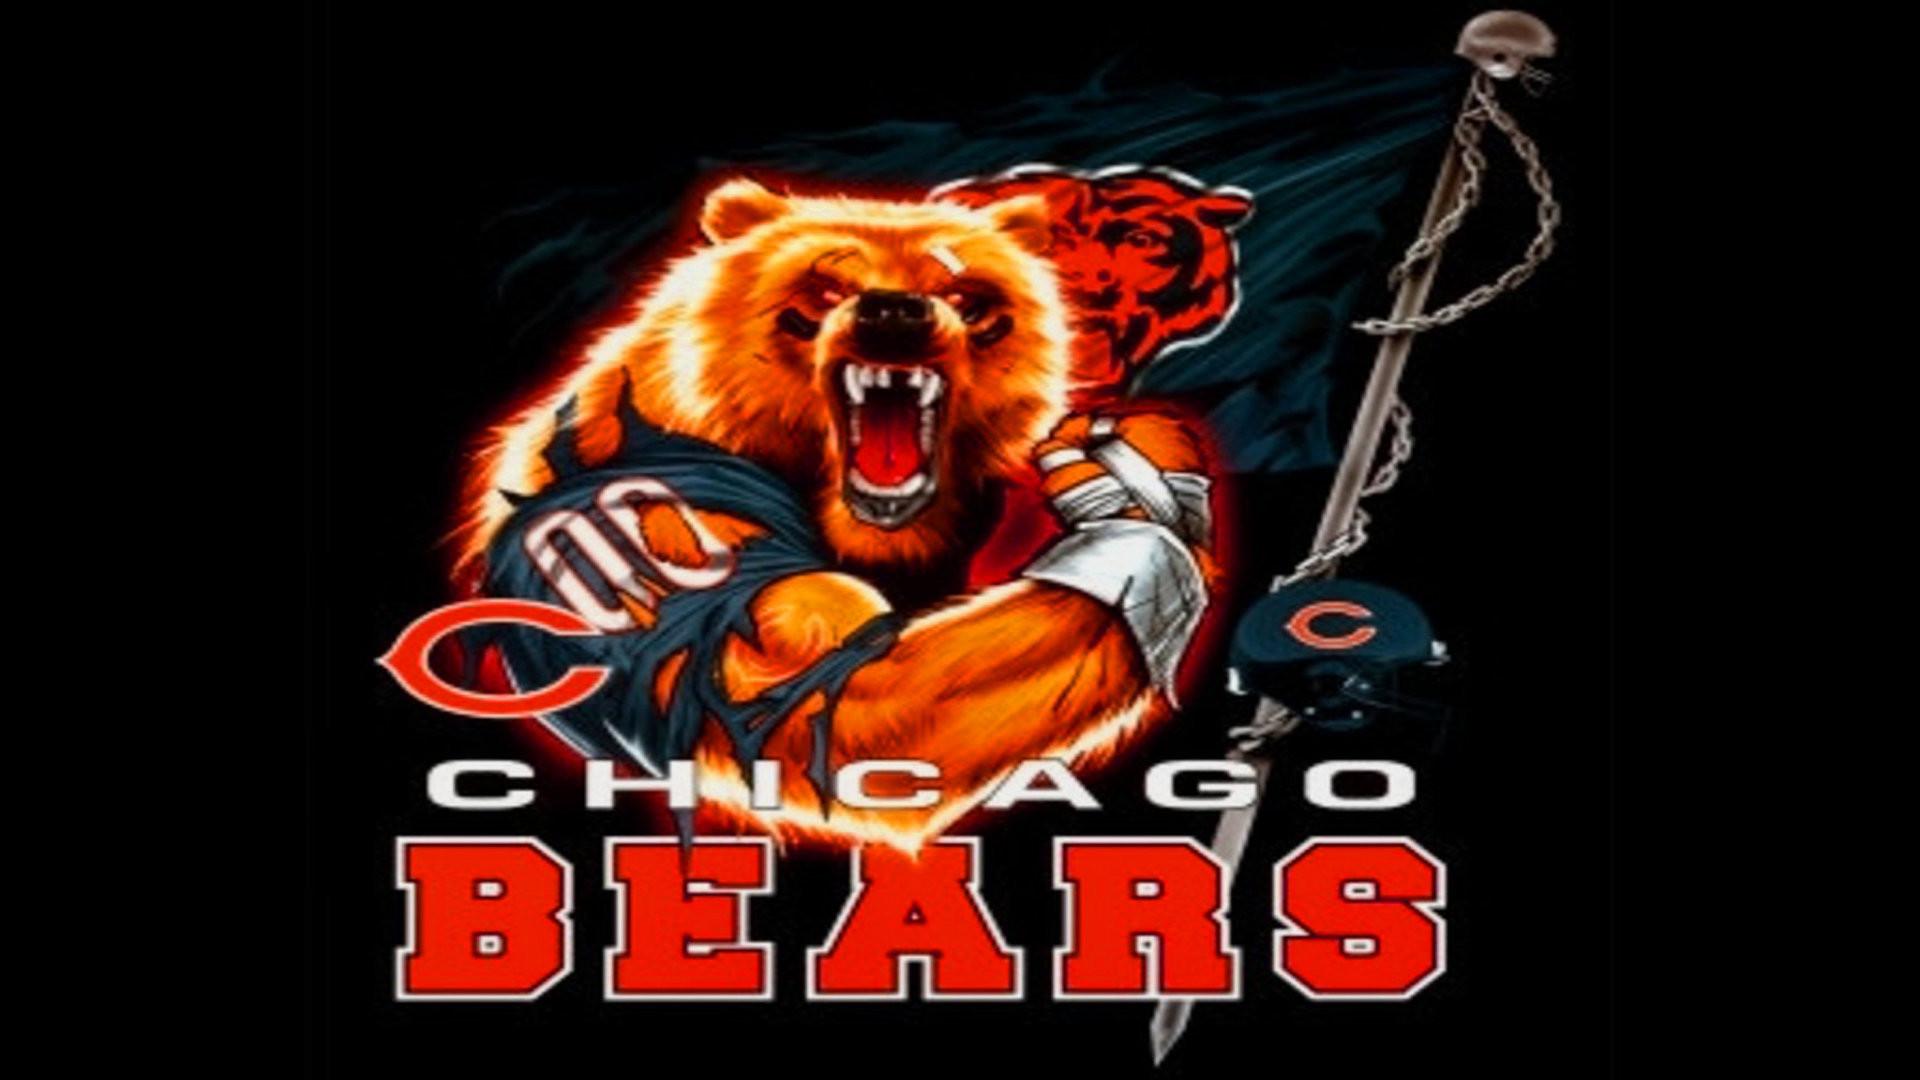 Chicago bears photos sports bag.